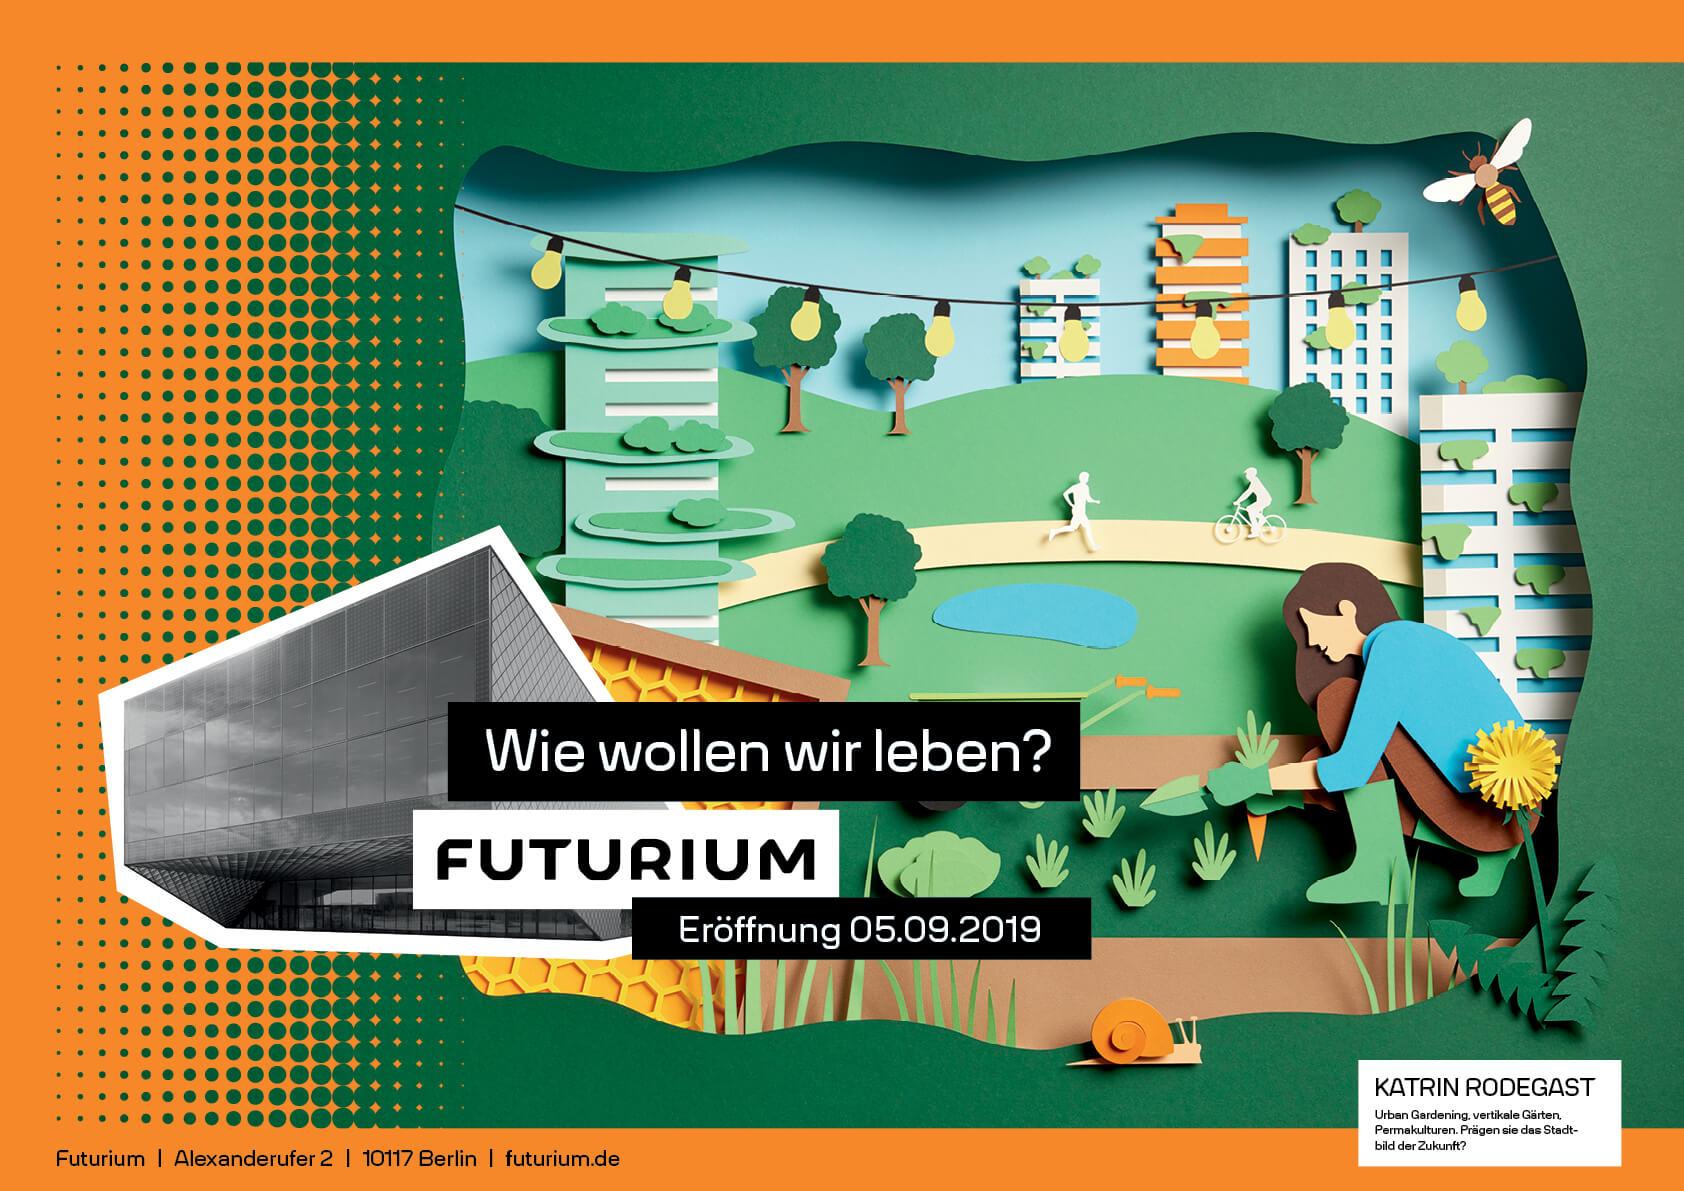 Futurium_KatrinRodegast